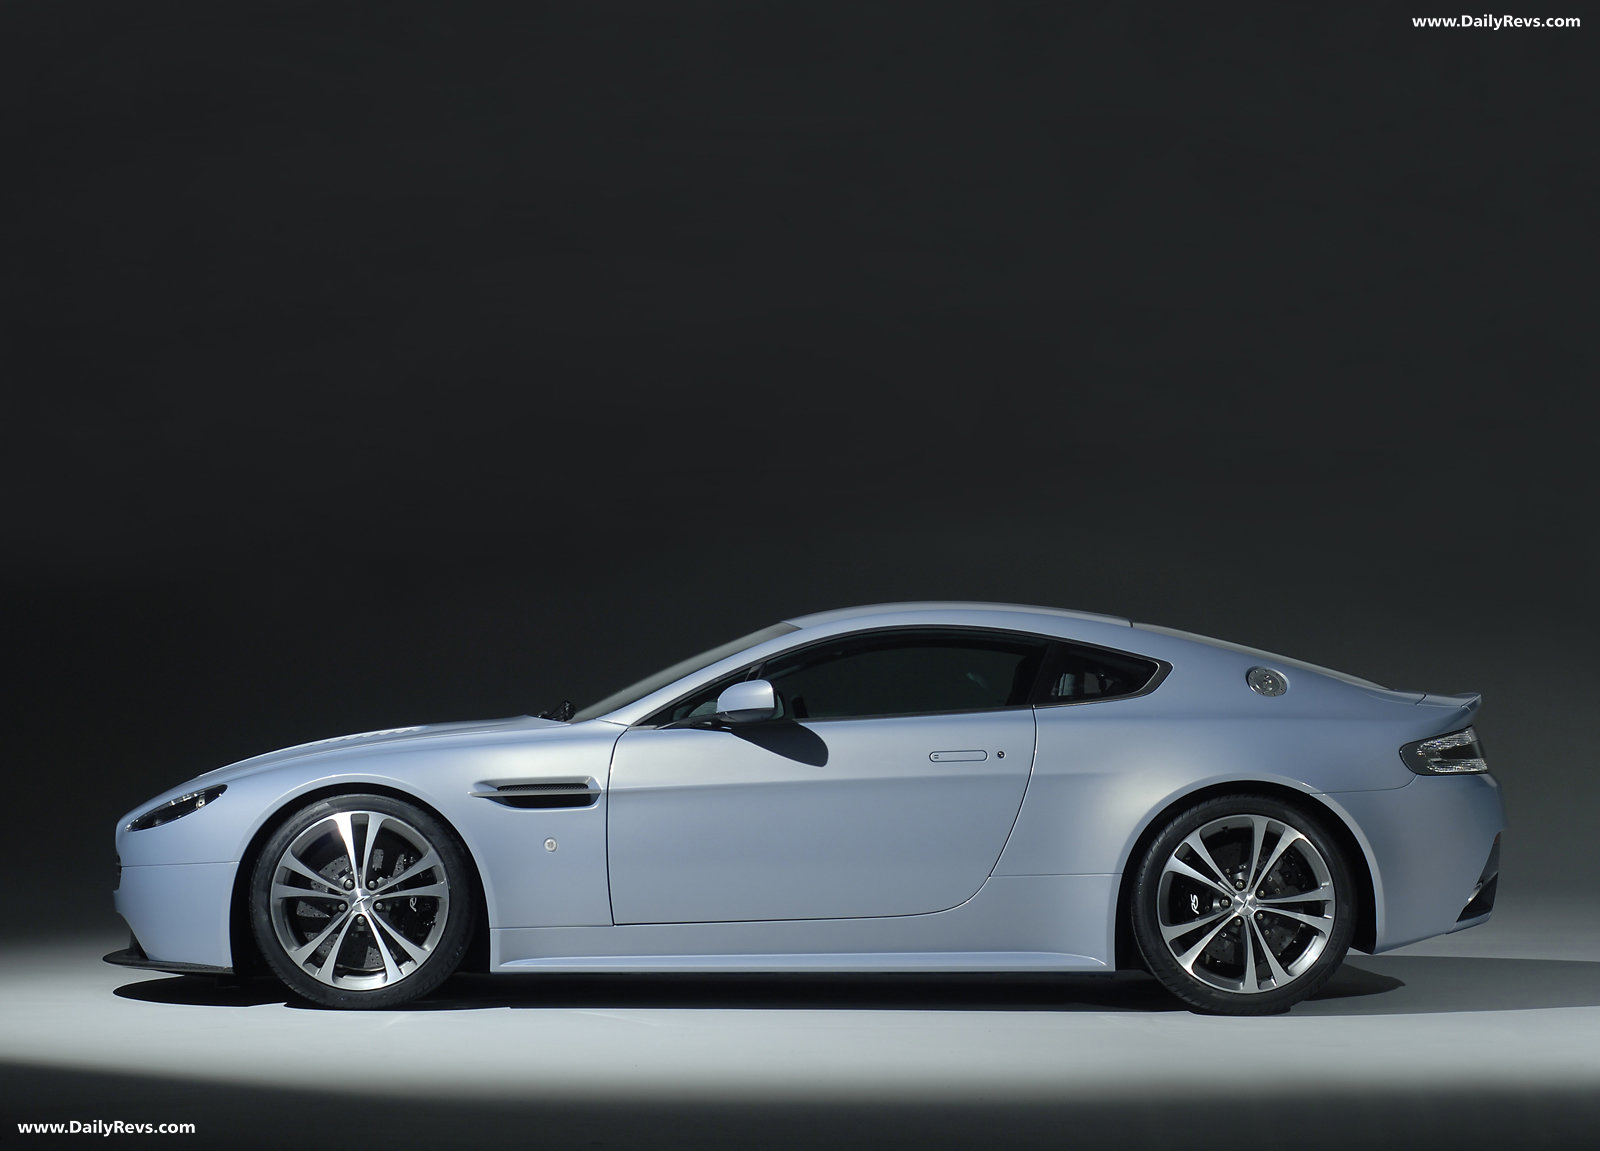 2007 Aston Martin V12 Vantage Rs Concept Dailyrevs